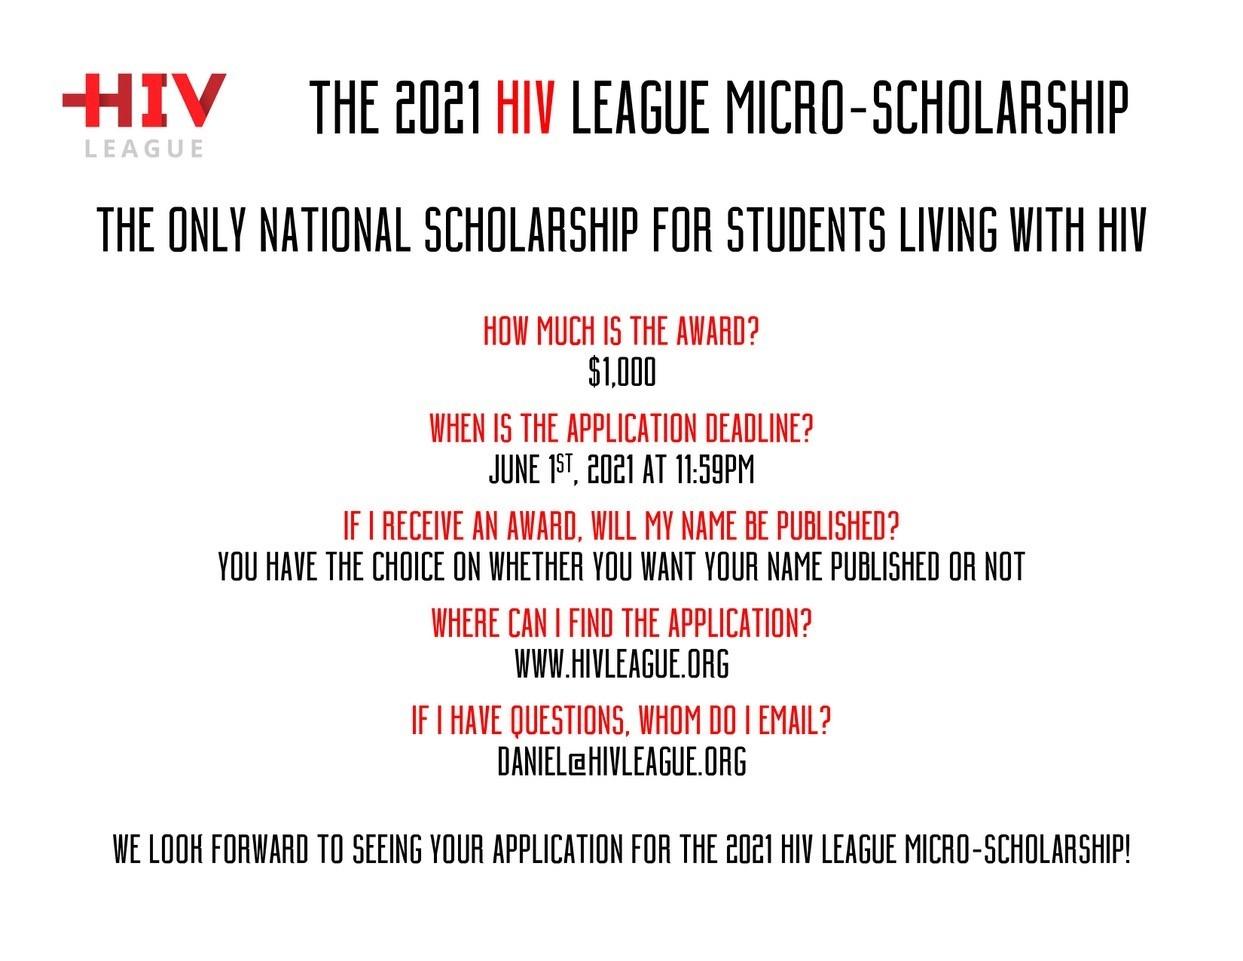 2021 HIV League Micro-Scholarship